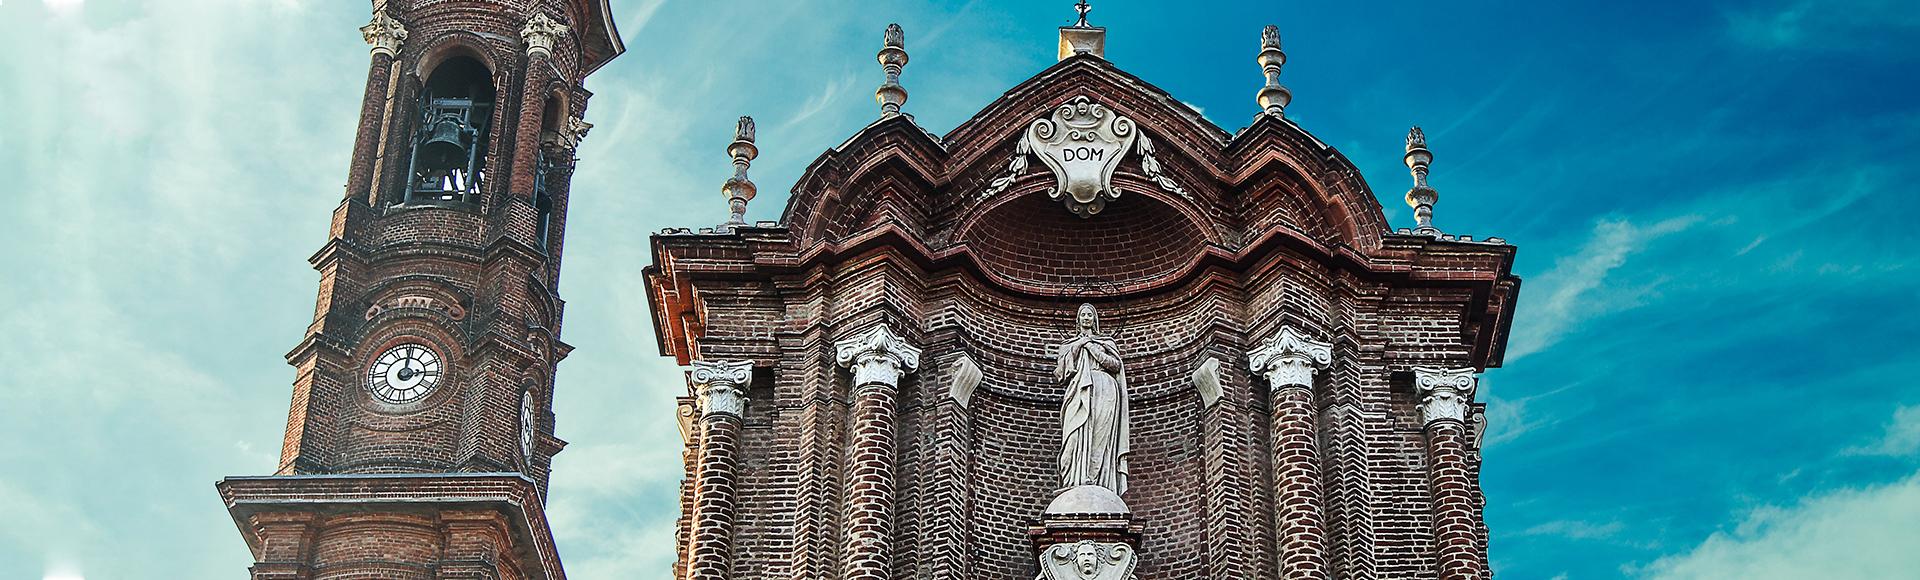 Parrocchia Santi Vincenzo e Anastasio